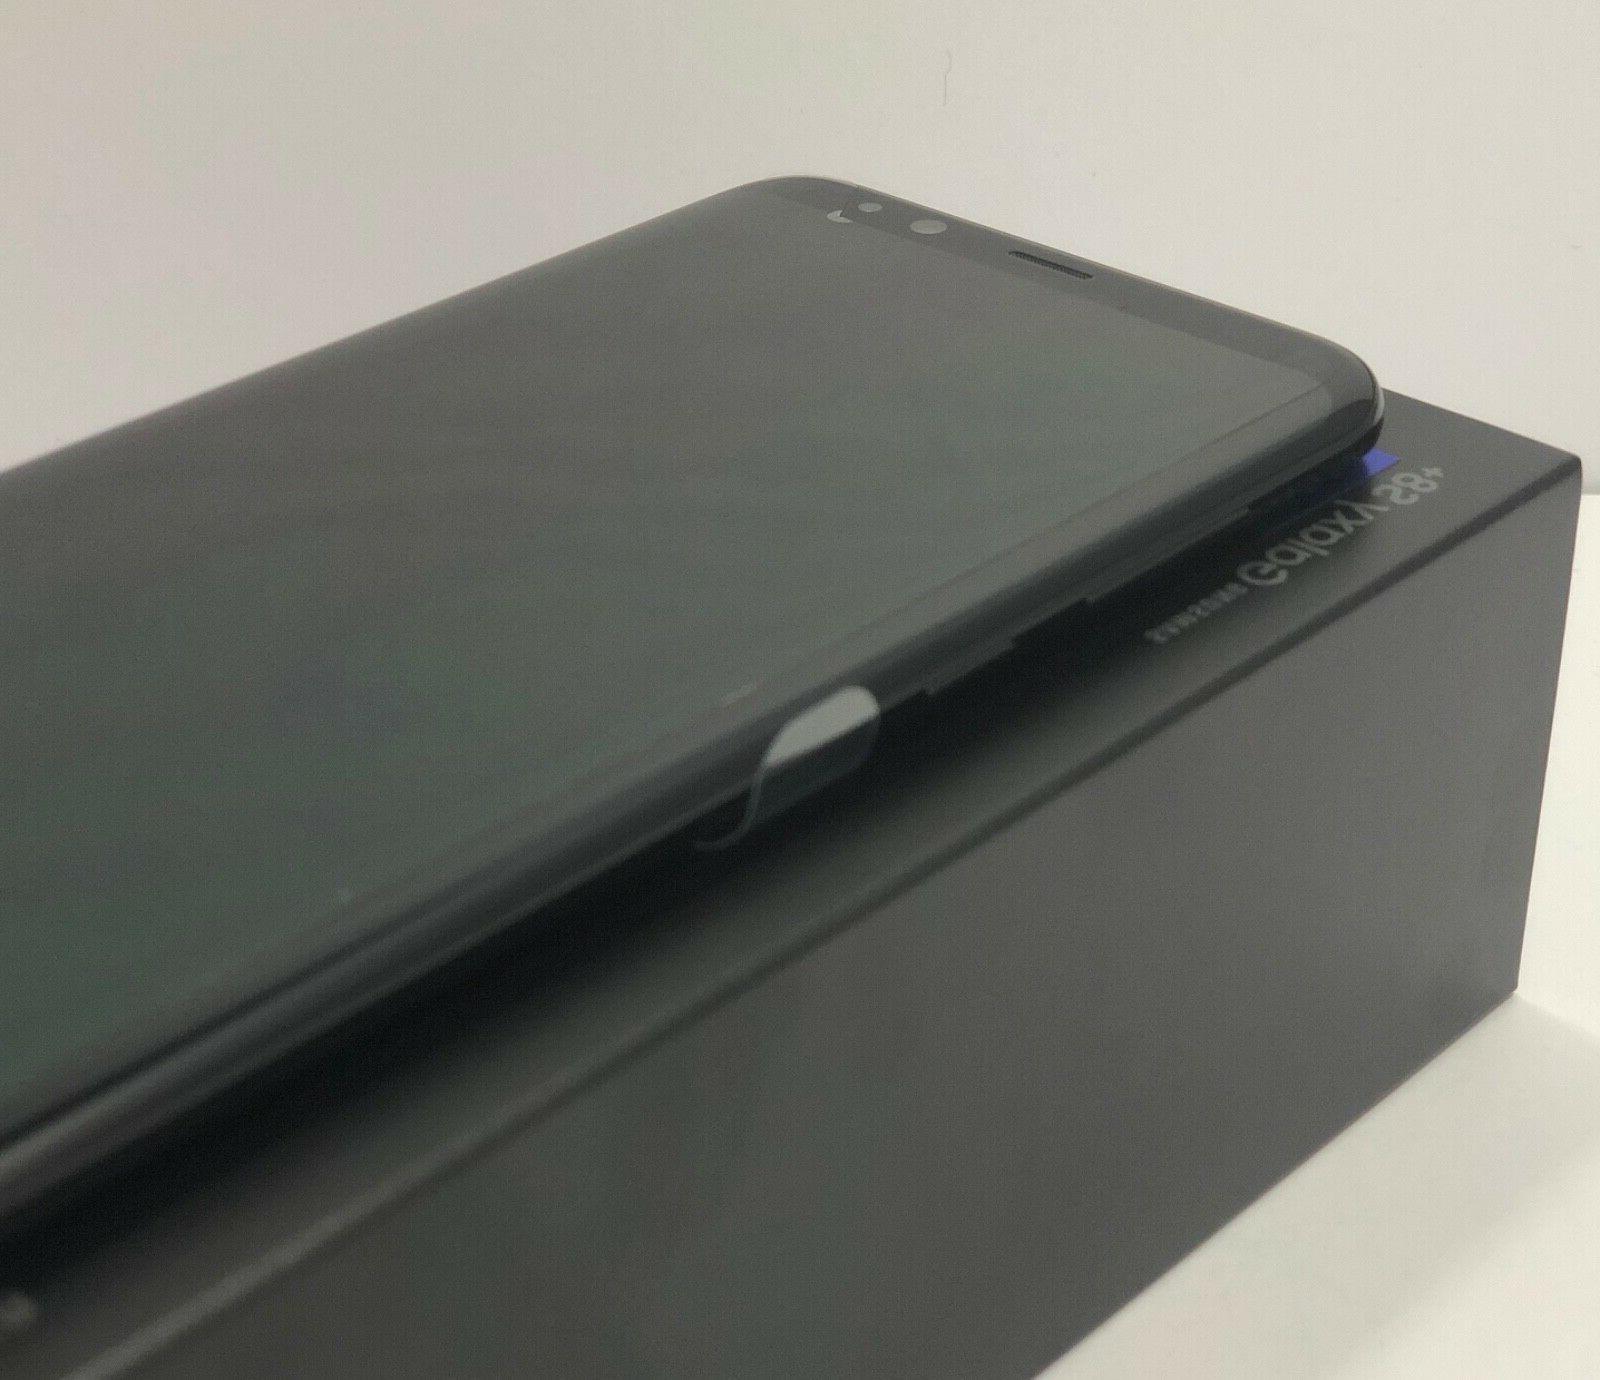 SAMSUNG GALAXY S8+PLUS SM-G955U1 BLACK SELECT